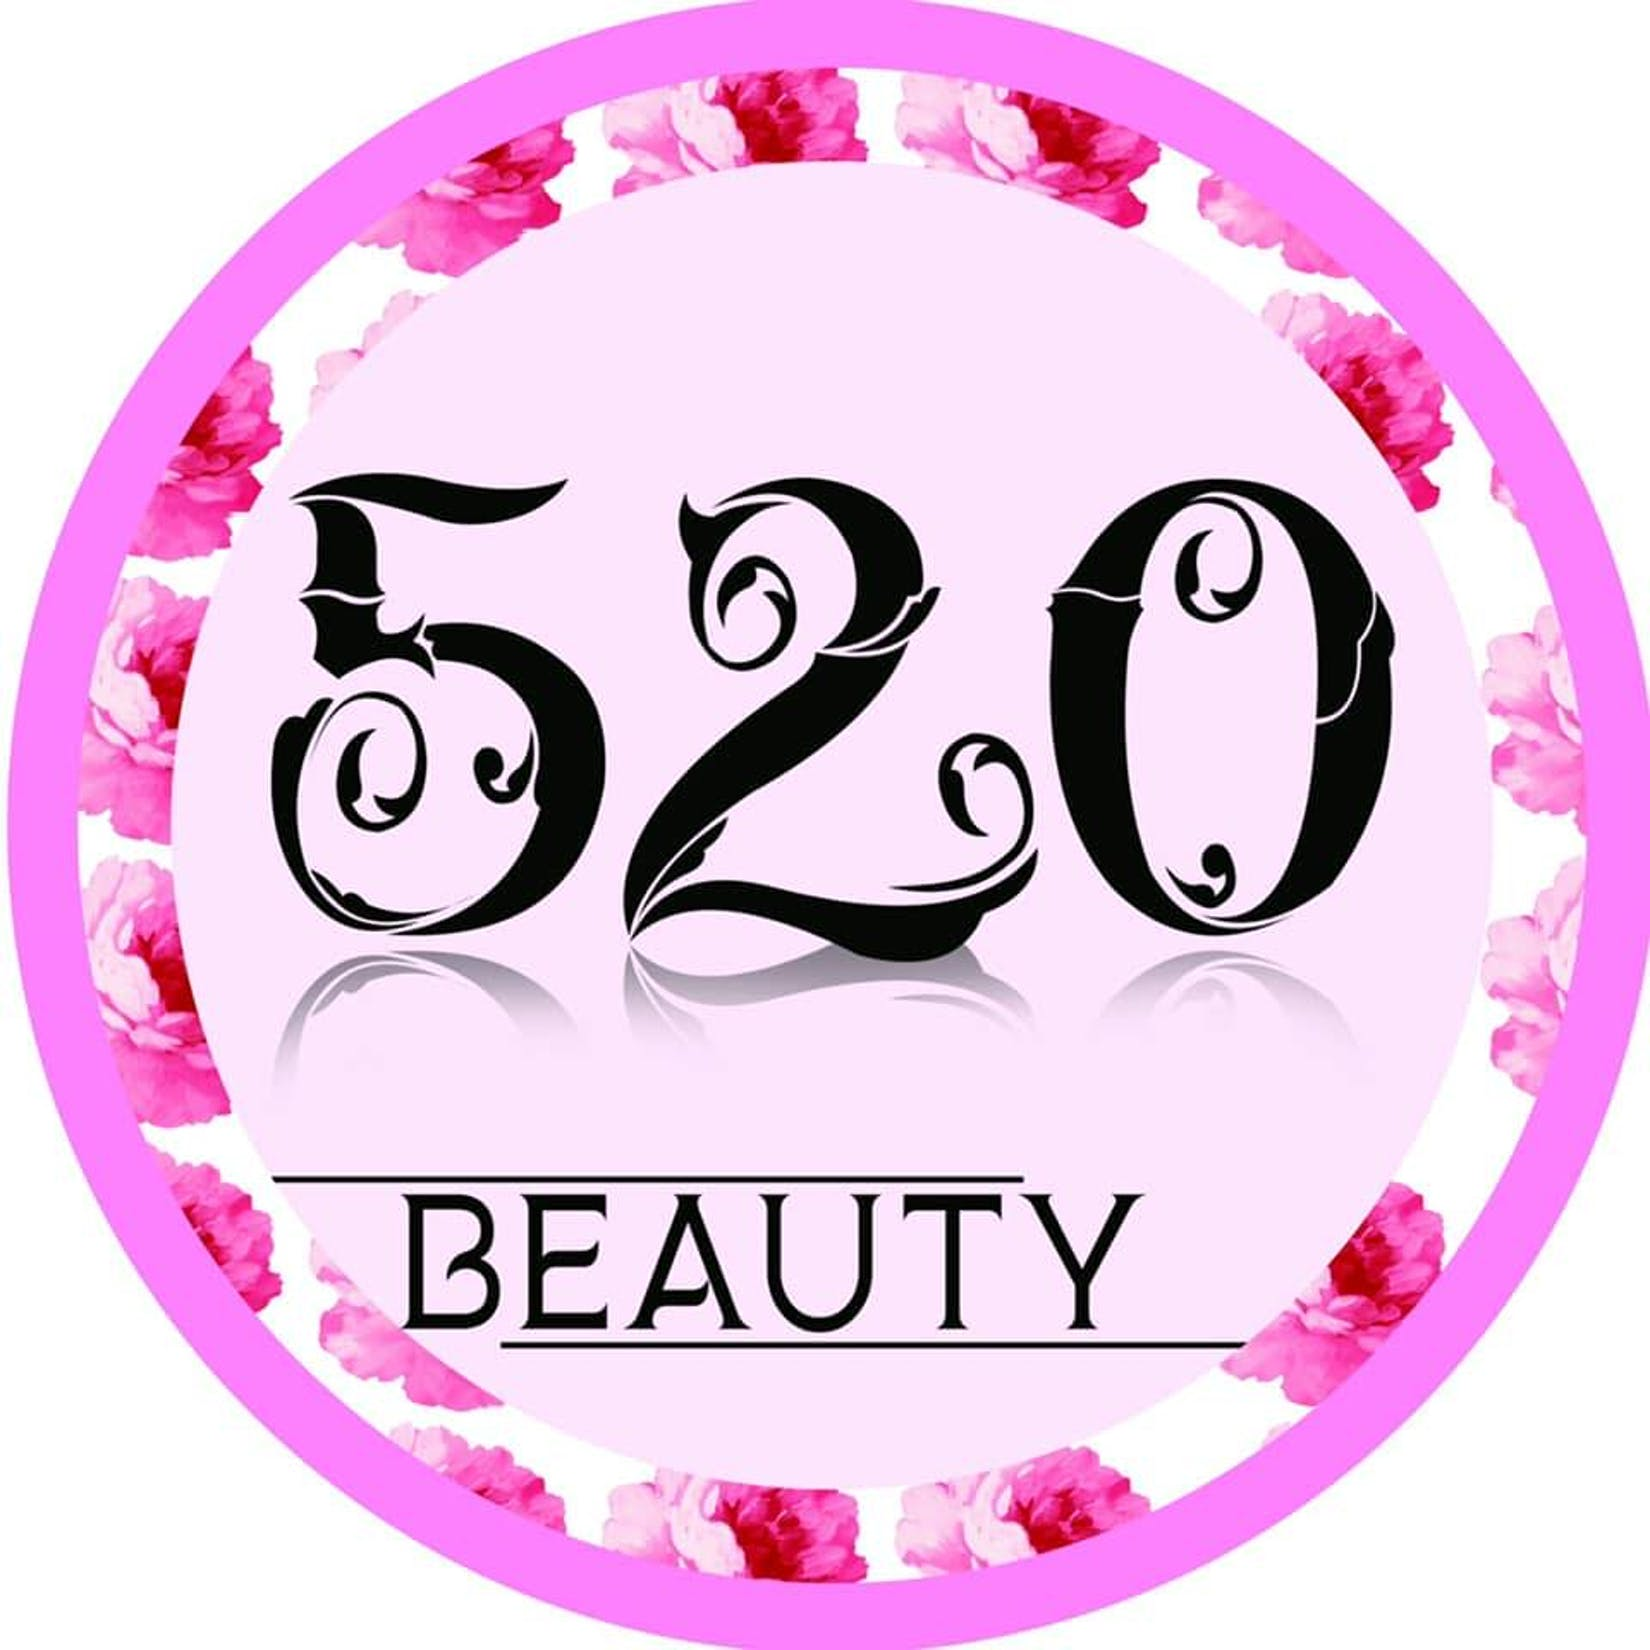 520 Beauty salon | Beauty